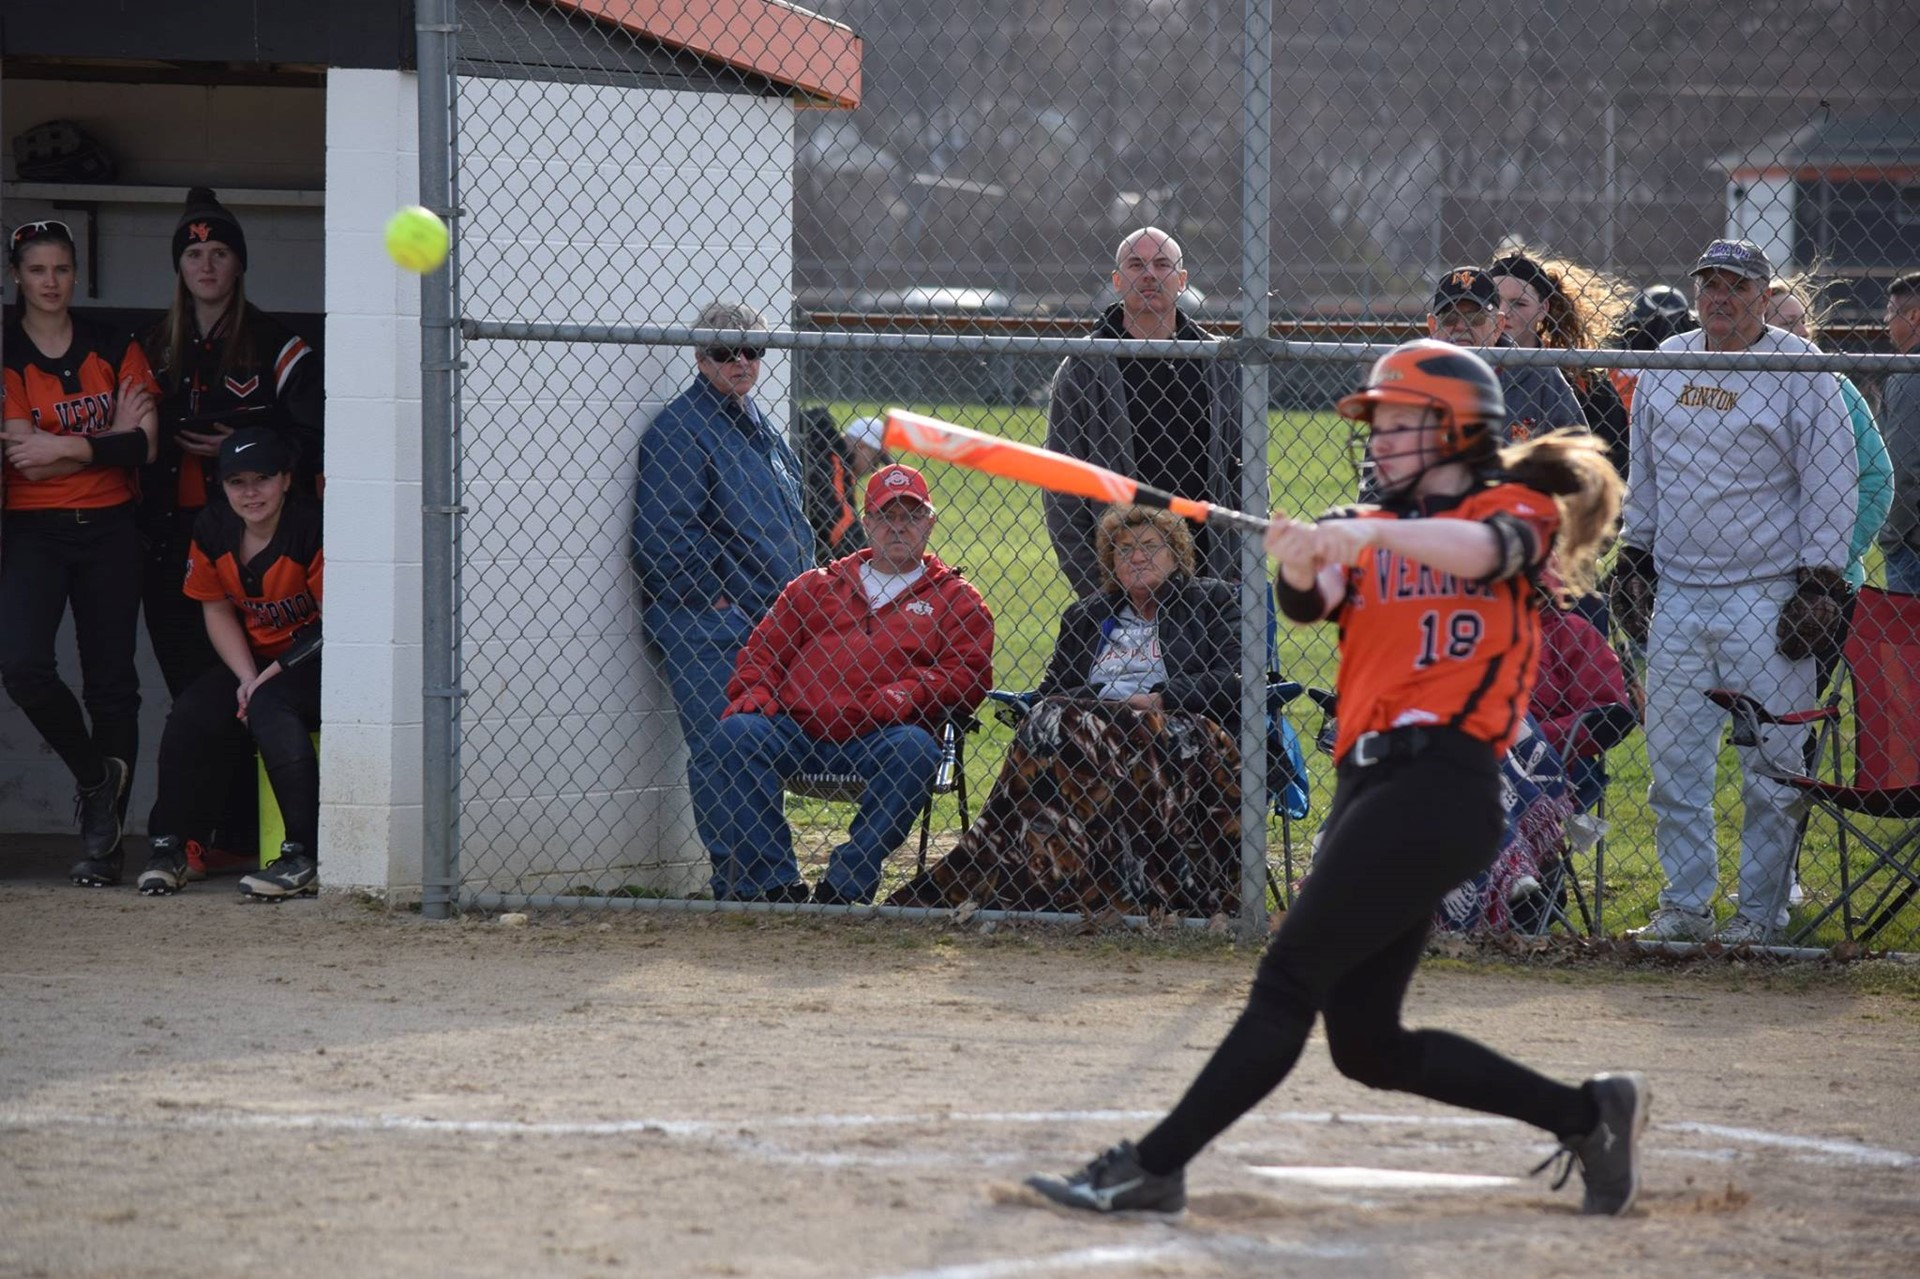 Hope Straight hitting for the Girls Softball Team